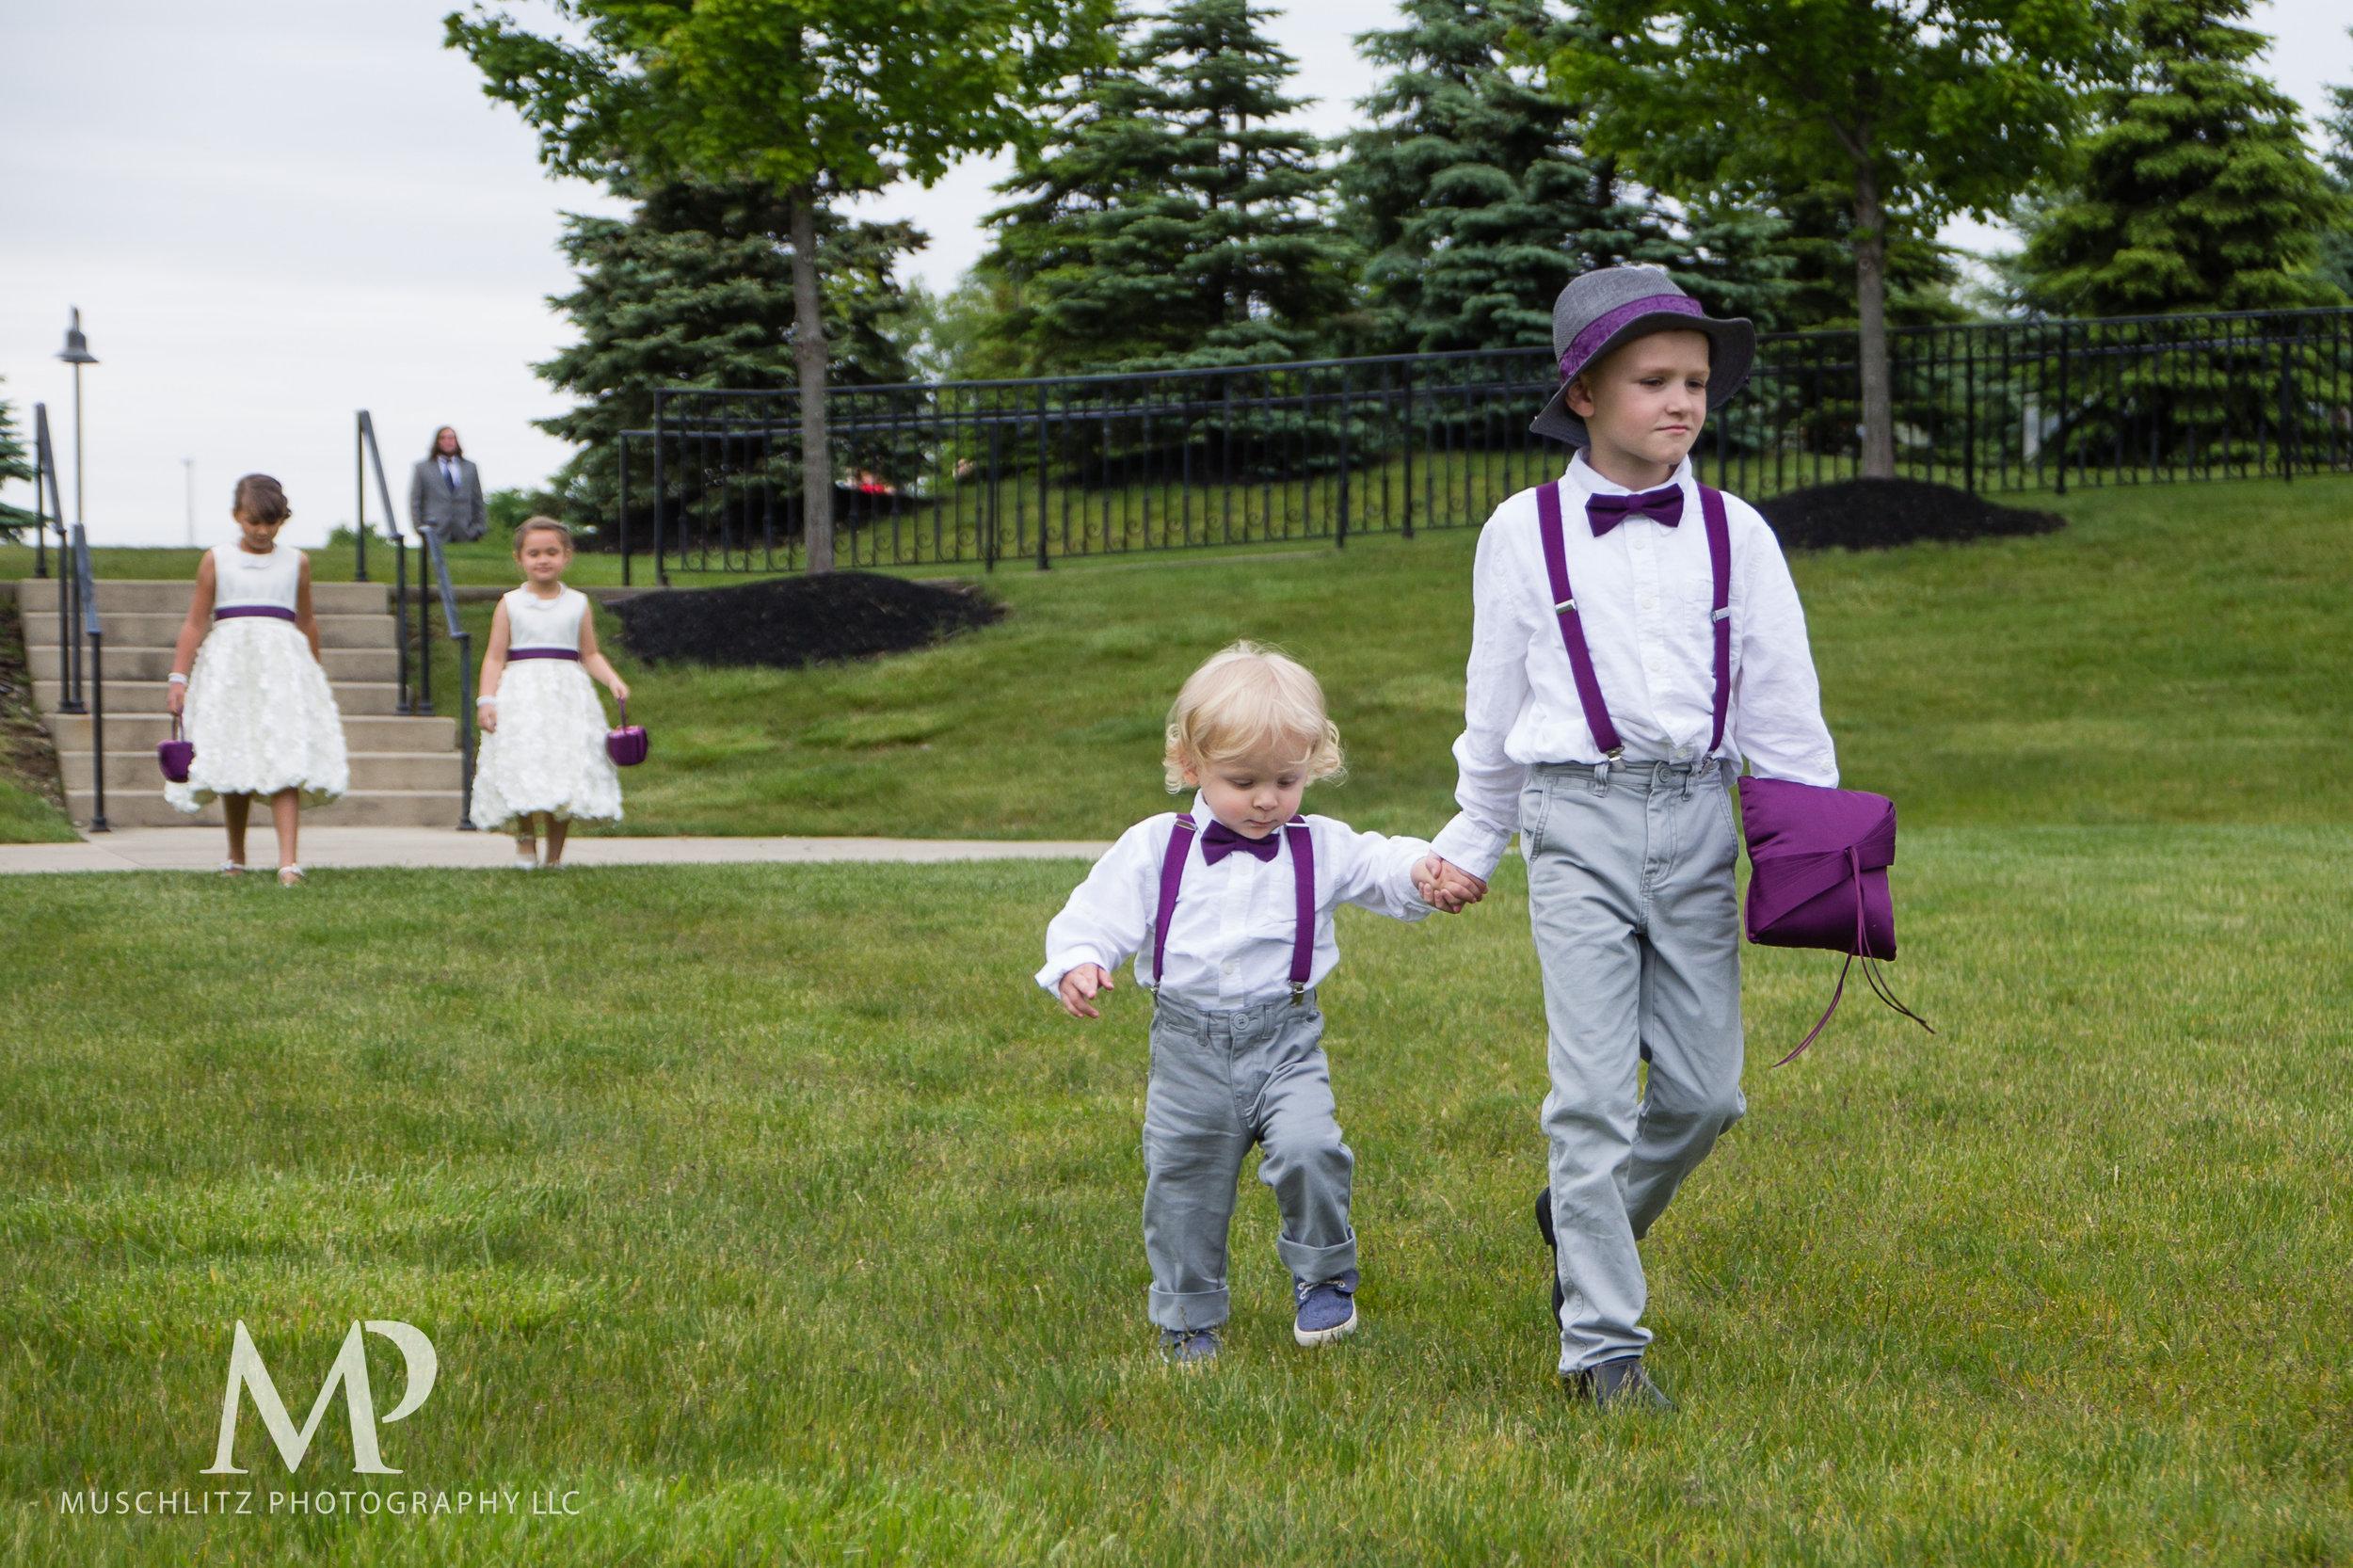 club-at-corazon-wedding-ceremony-reception-columbus-dublin-ohio-ohio-university-theme-026.JPG